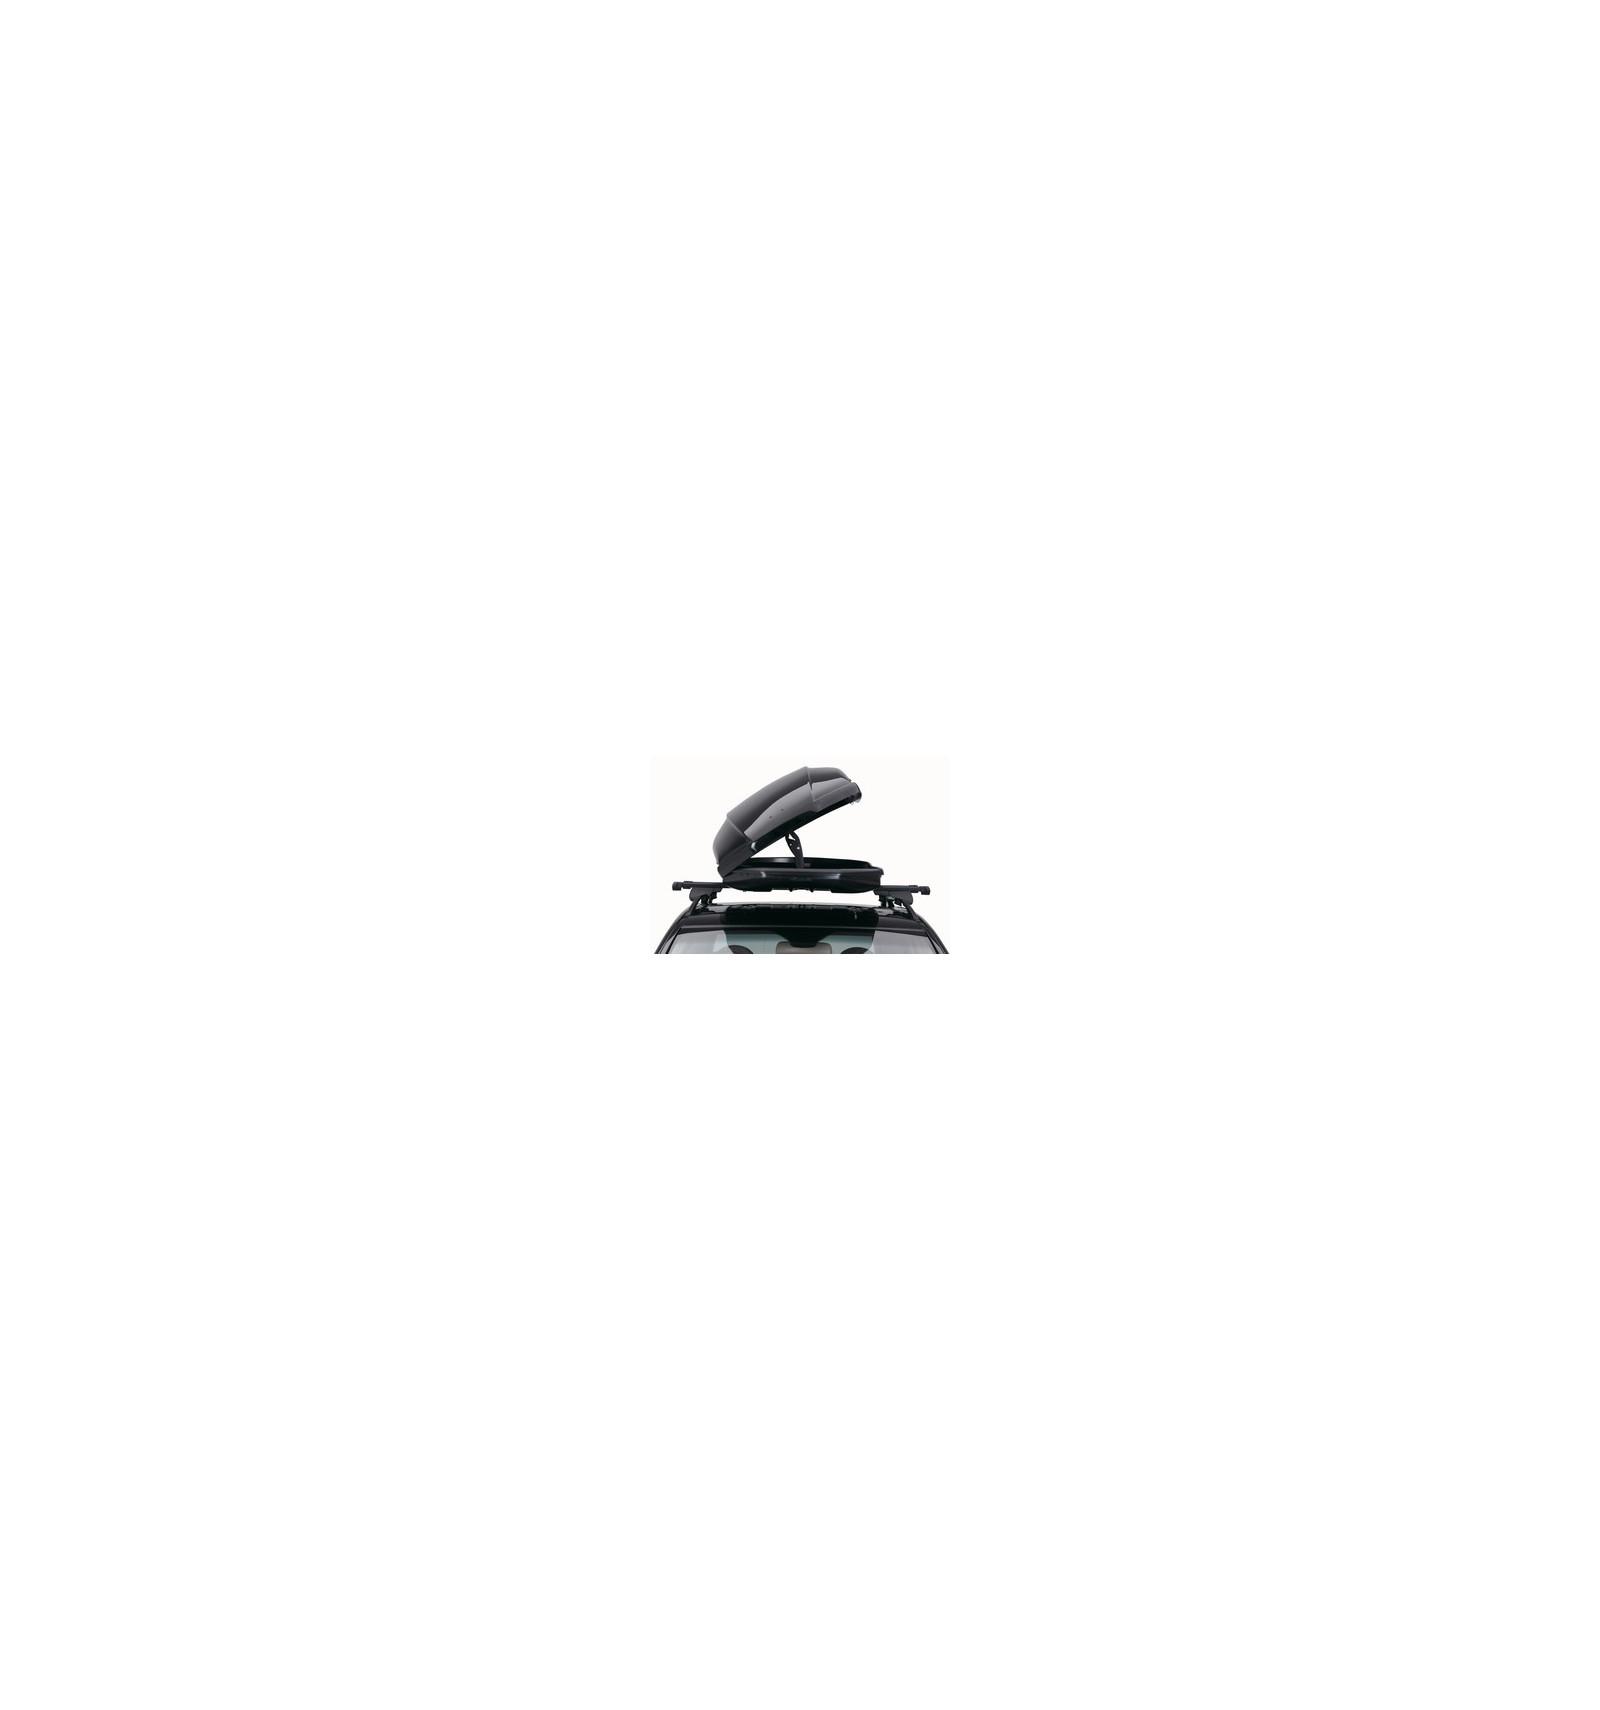 coffre de toit thule motion 600 black glossy alpinstore. Black Bedroom Furniture Sets. Home Design Ideas